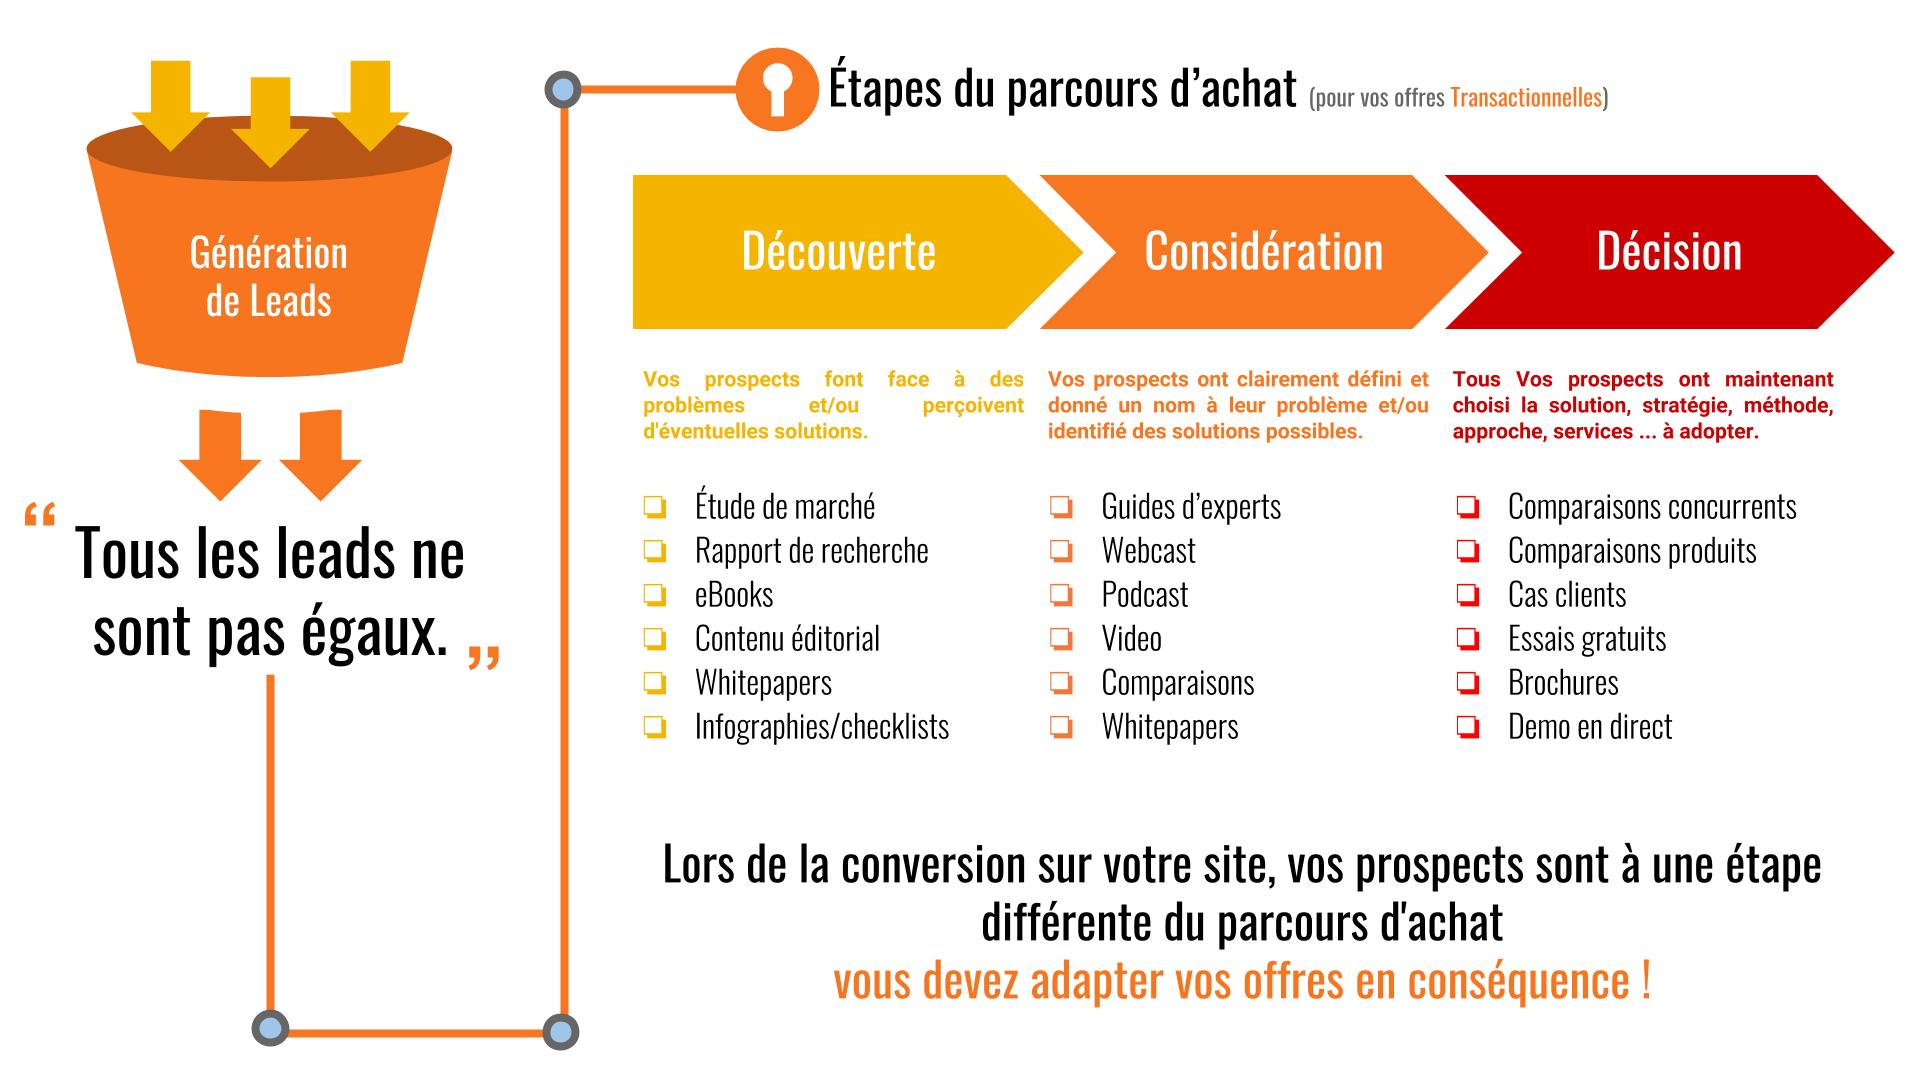 Infographies+Convertir+et+Qualifier+ +content+offers+buyer%27s+journey